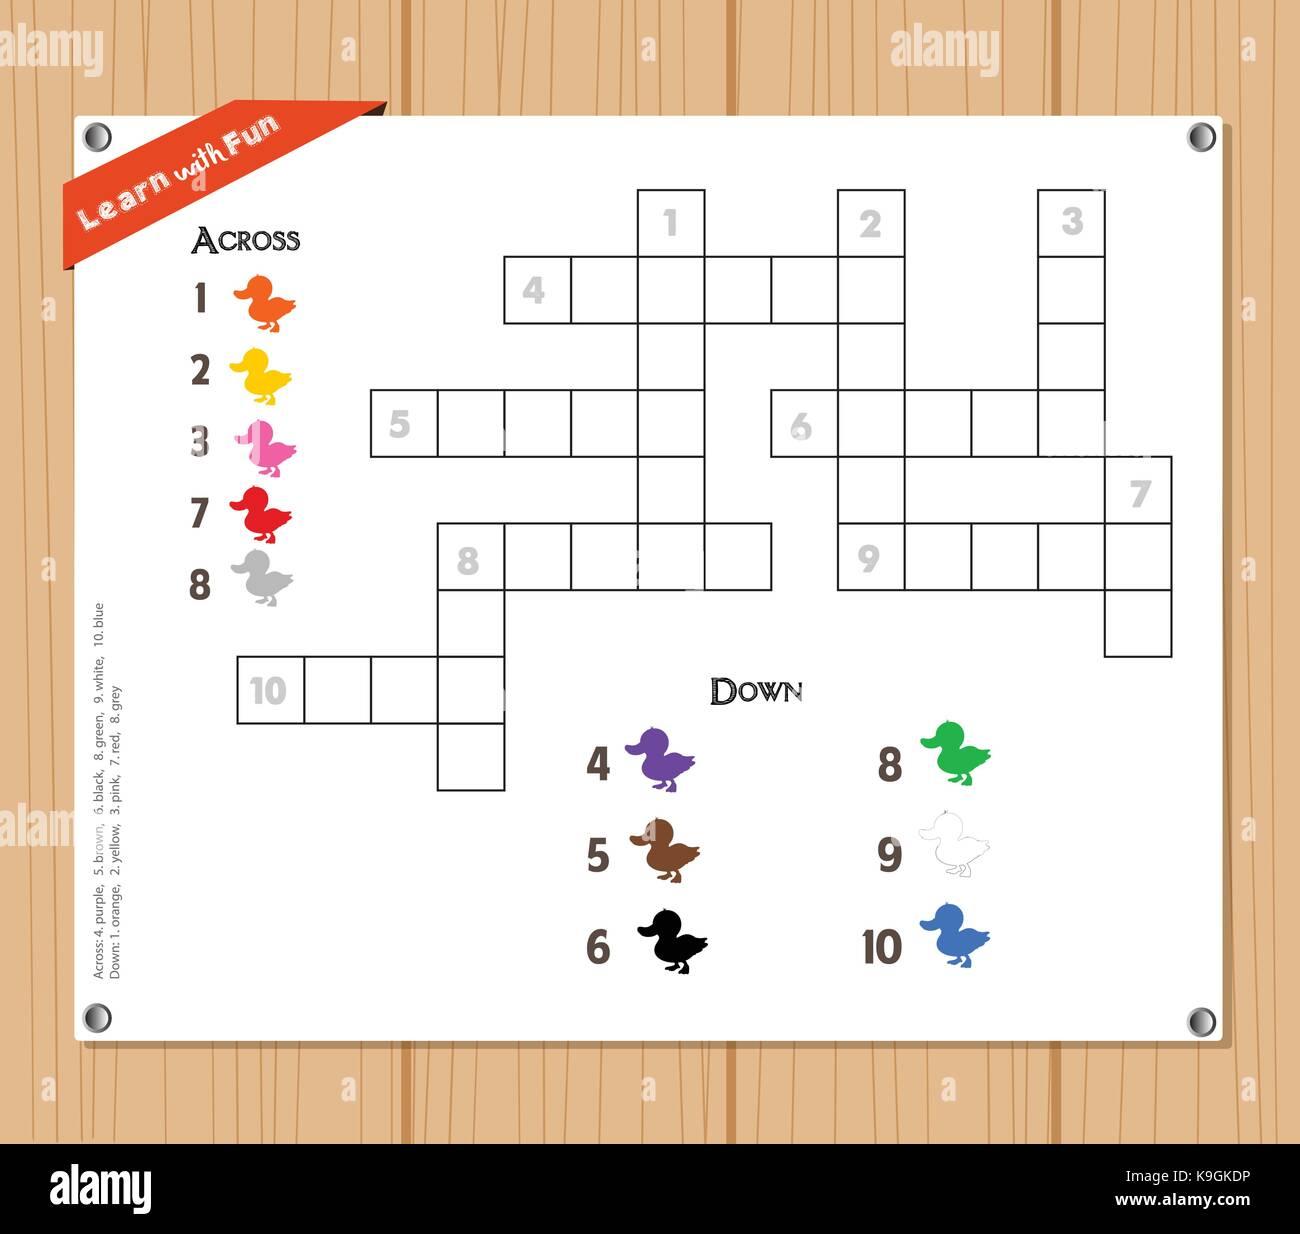 Crossword Puzzle Child Stockfotos & Crossword Puzzle Child Bilder ...